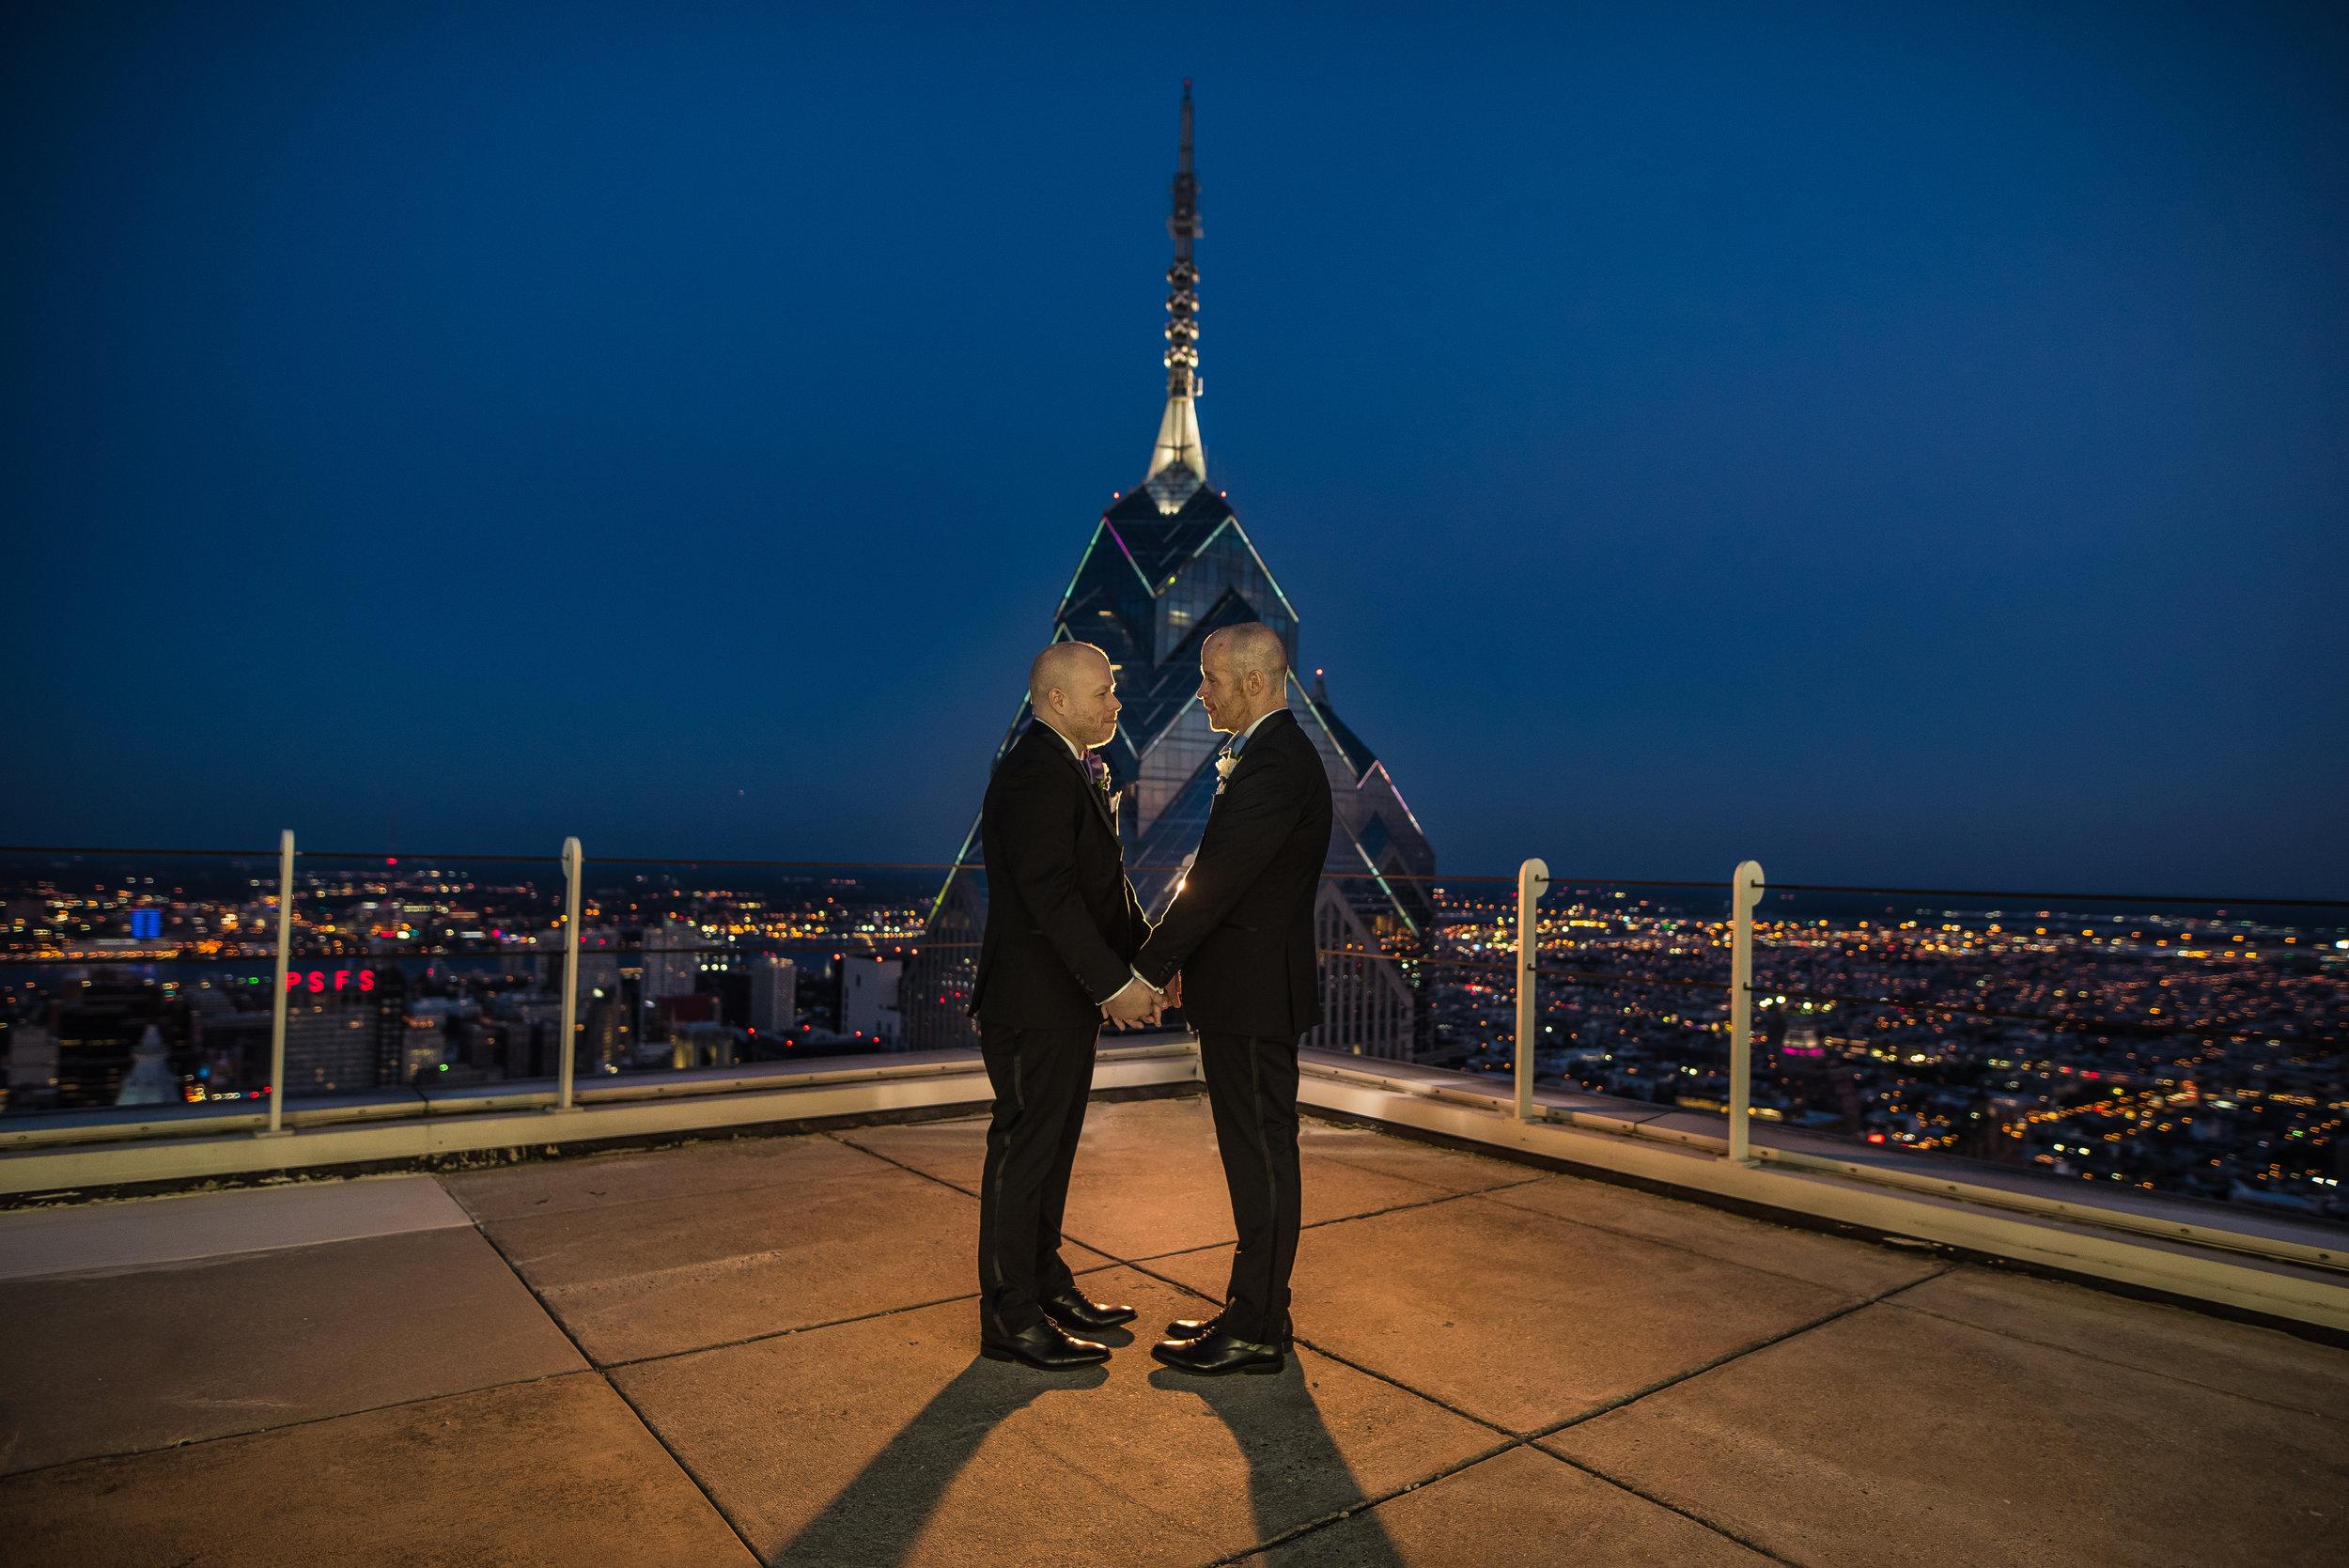 Photographer David McShea got some amazing shots on the Pyramid Club's 53rd floor roof!